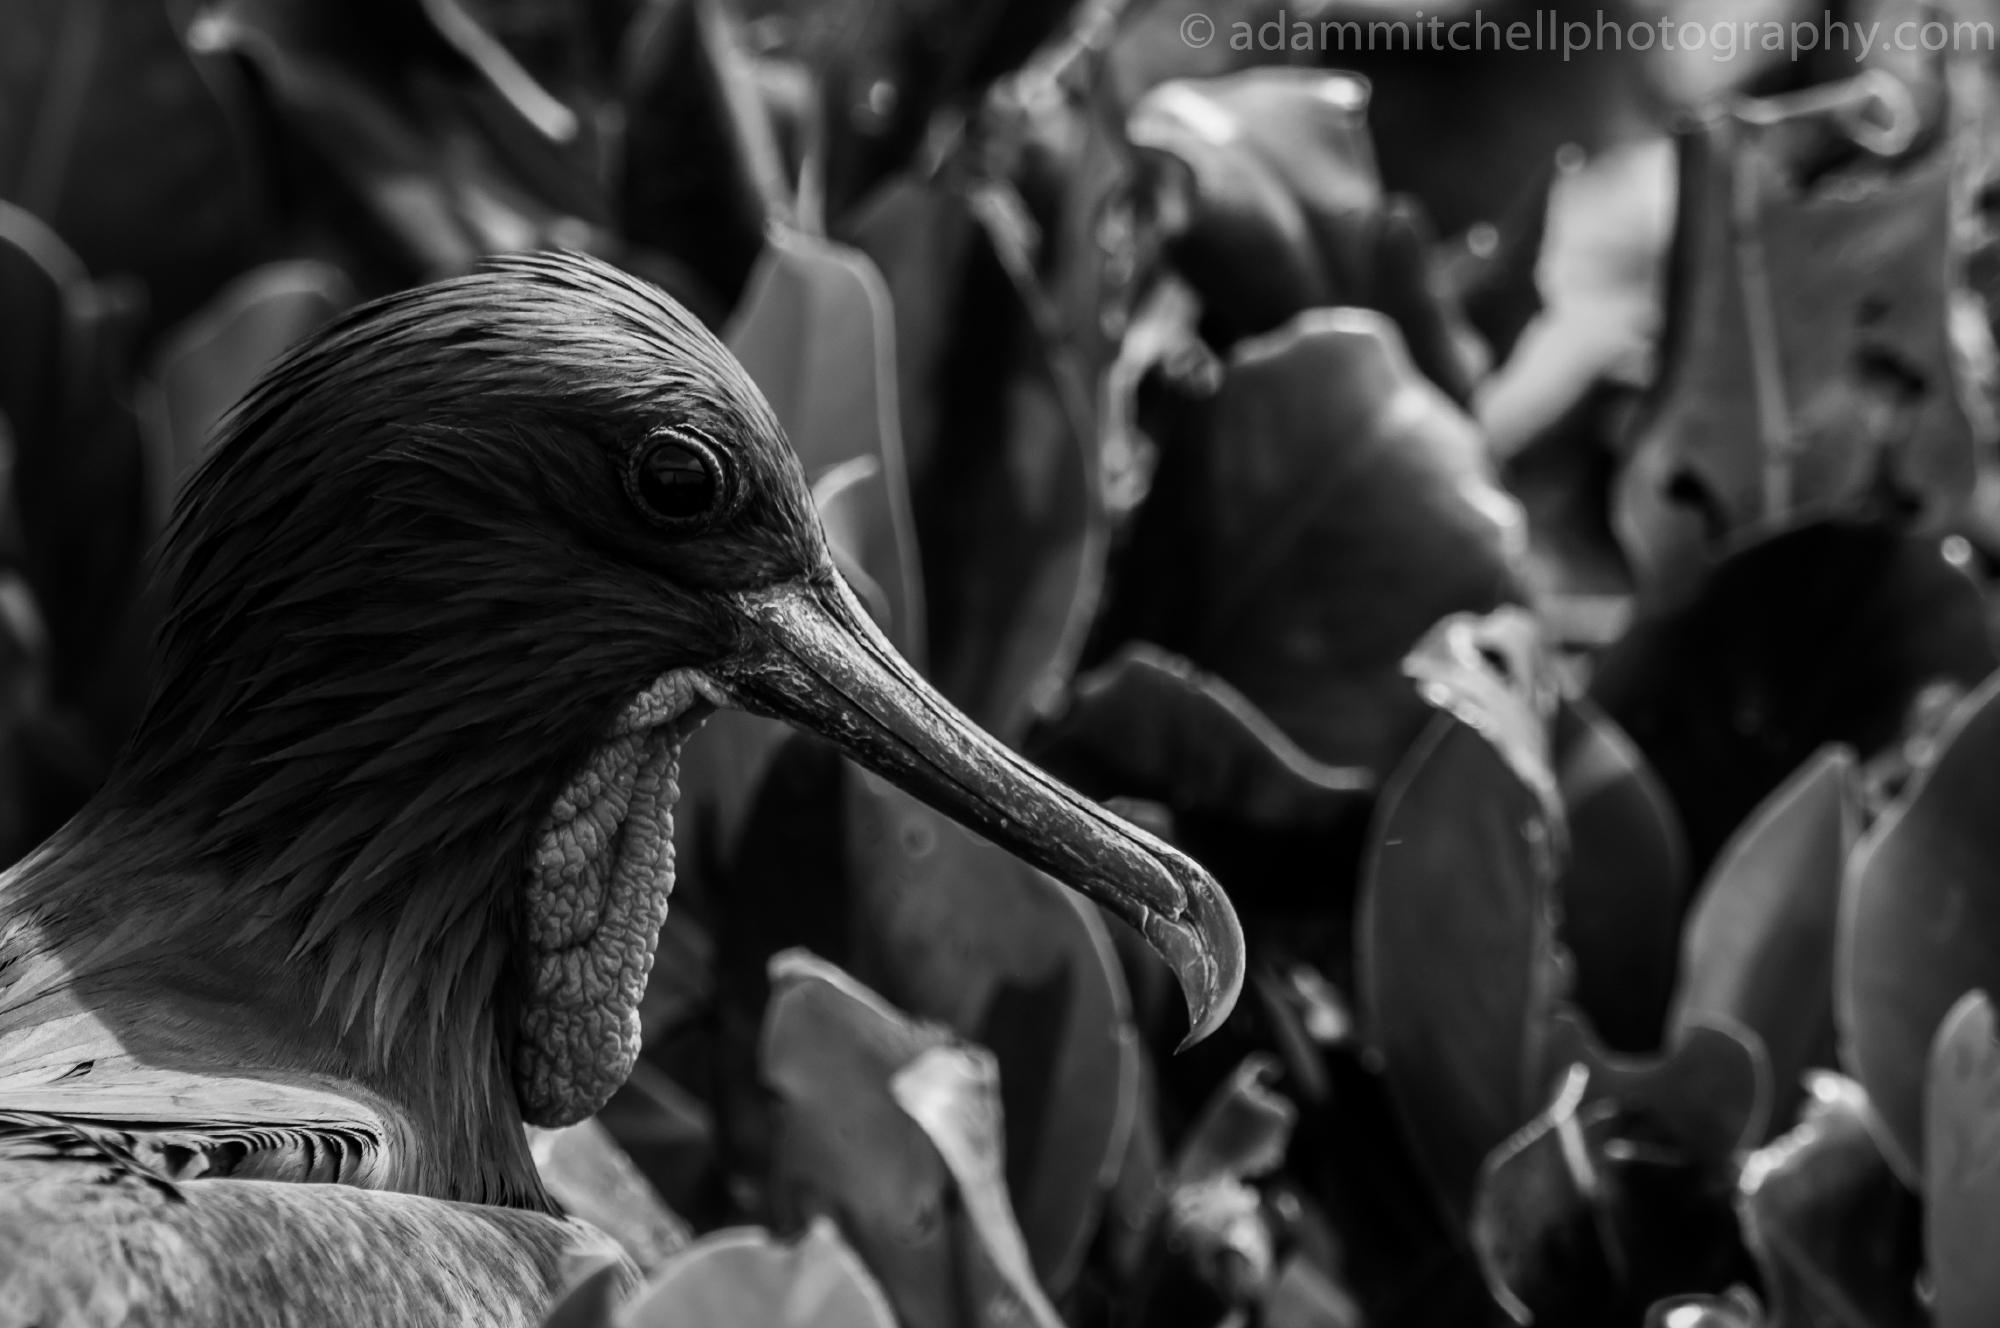 Frigate, Aldabra